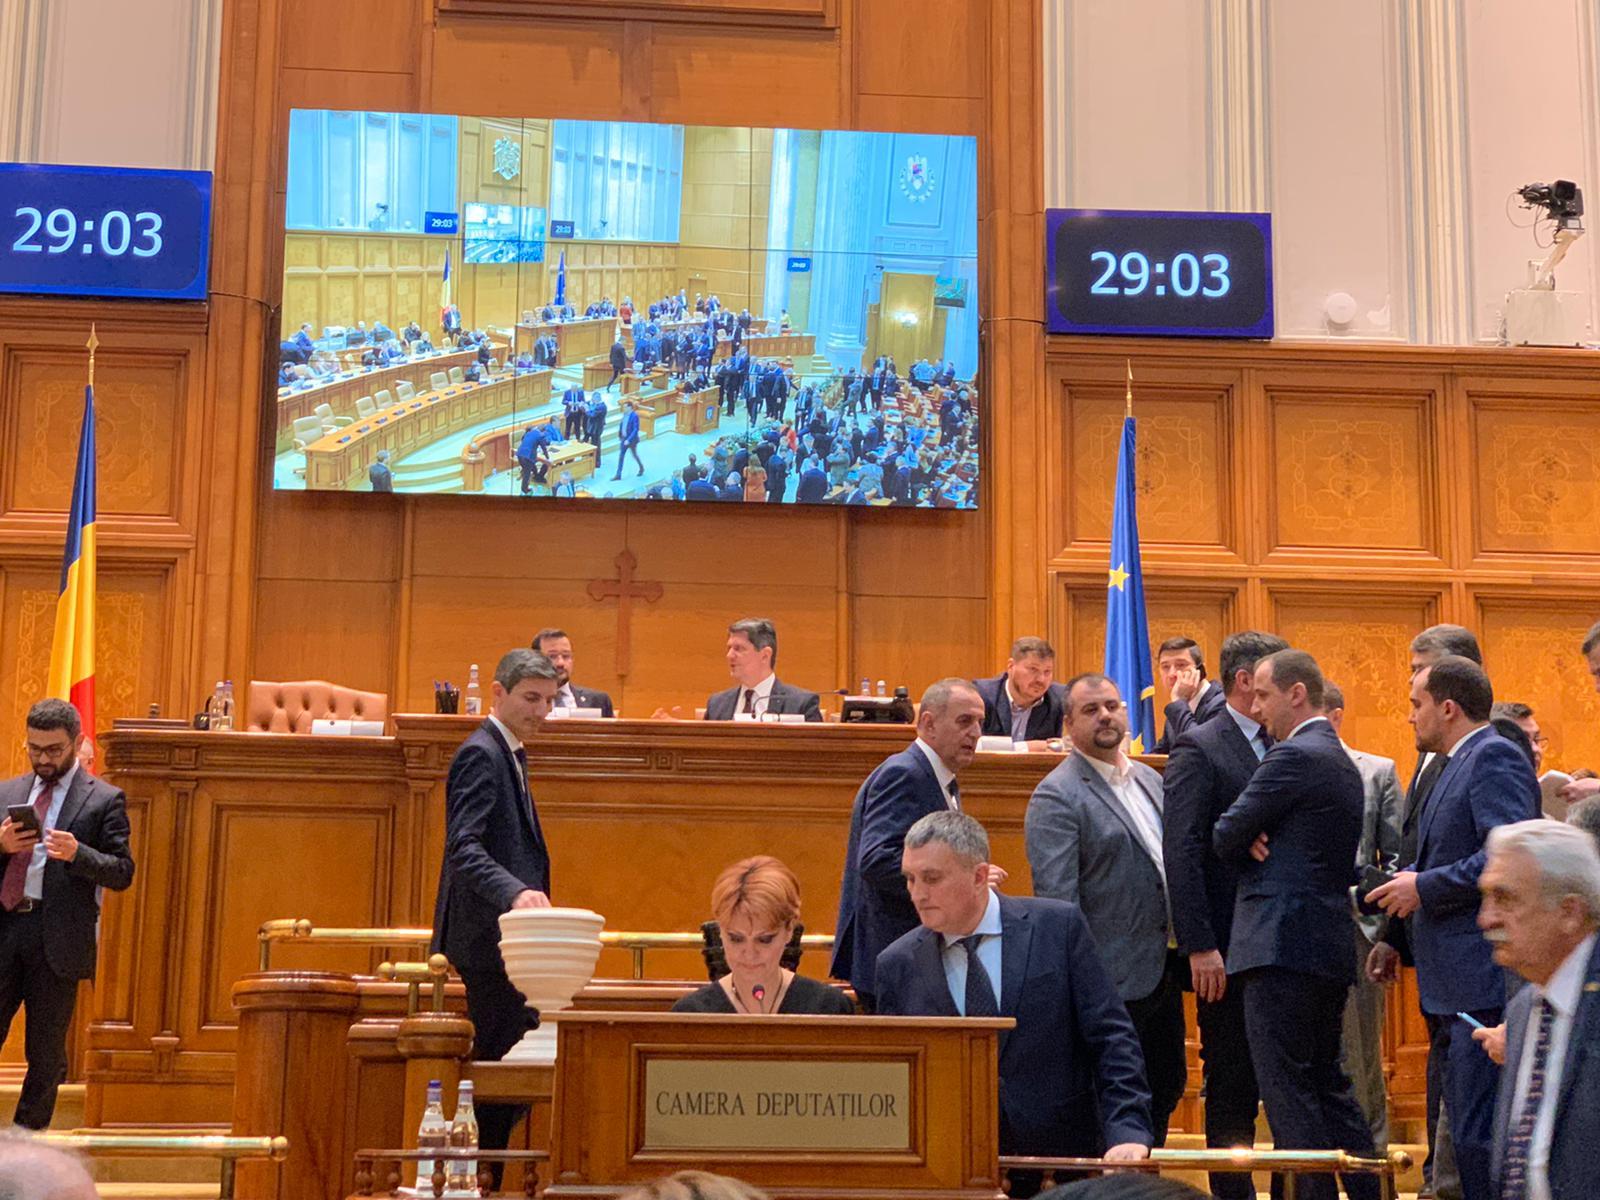 visan parlament camera deputatilor